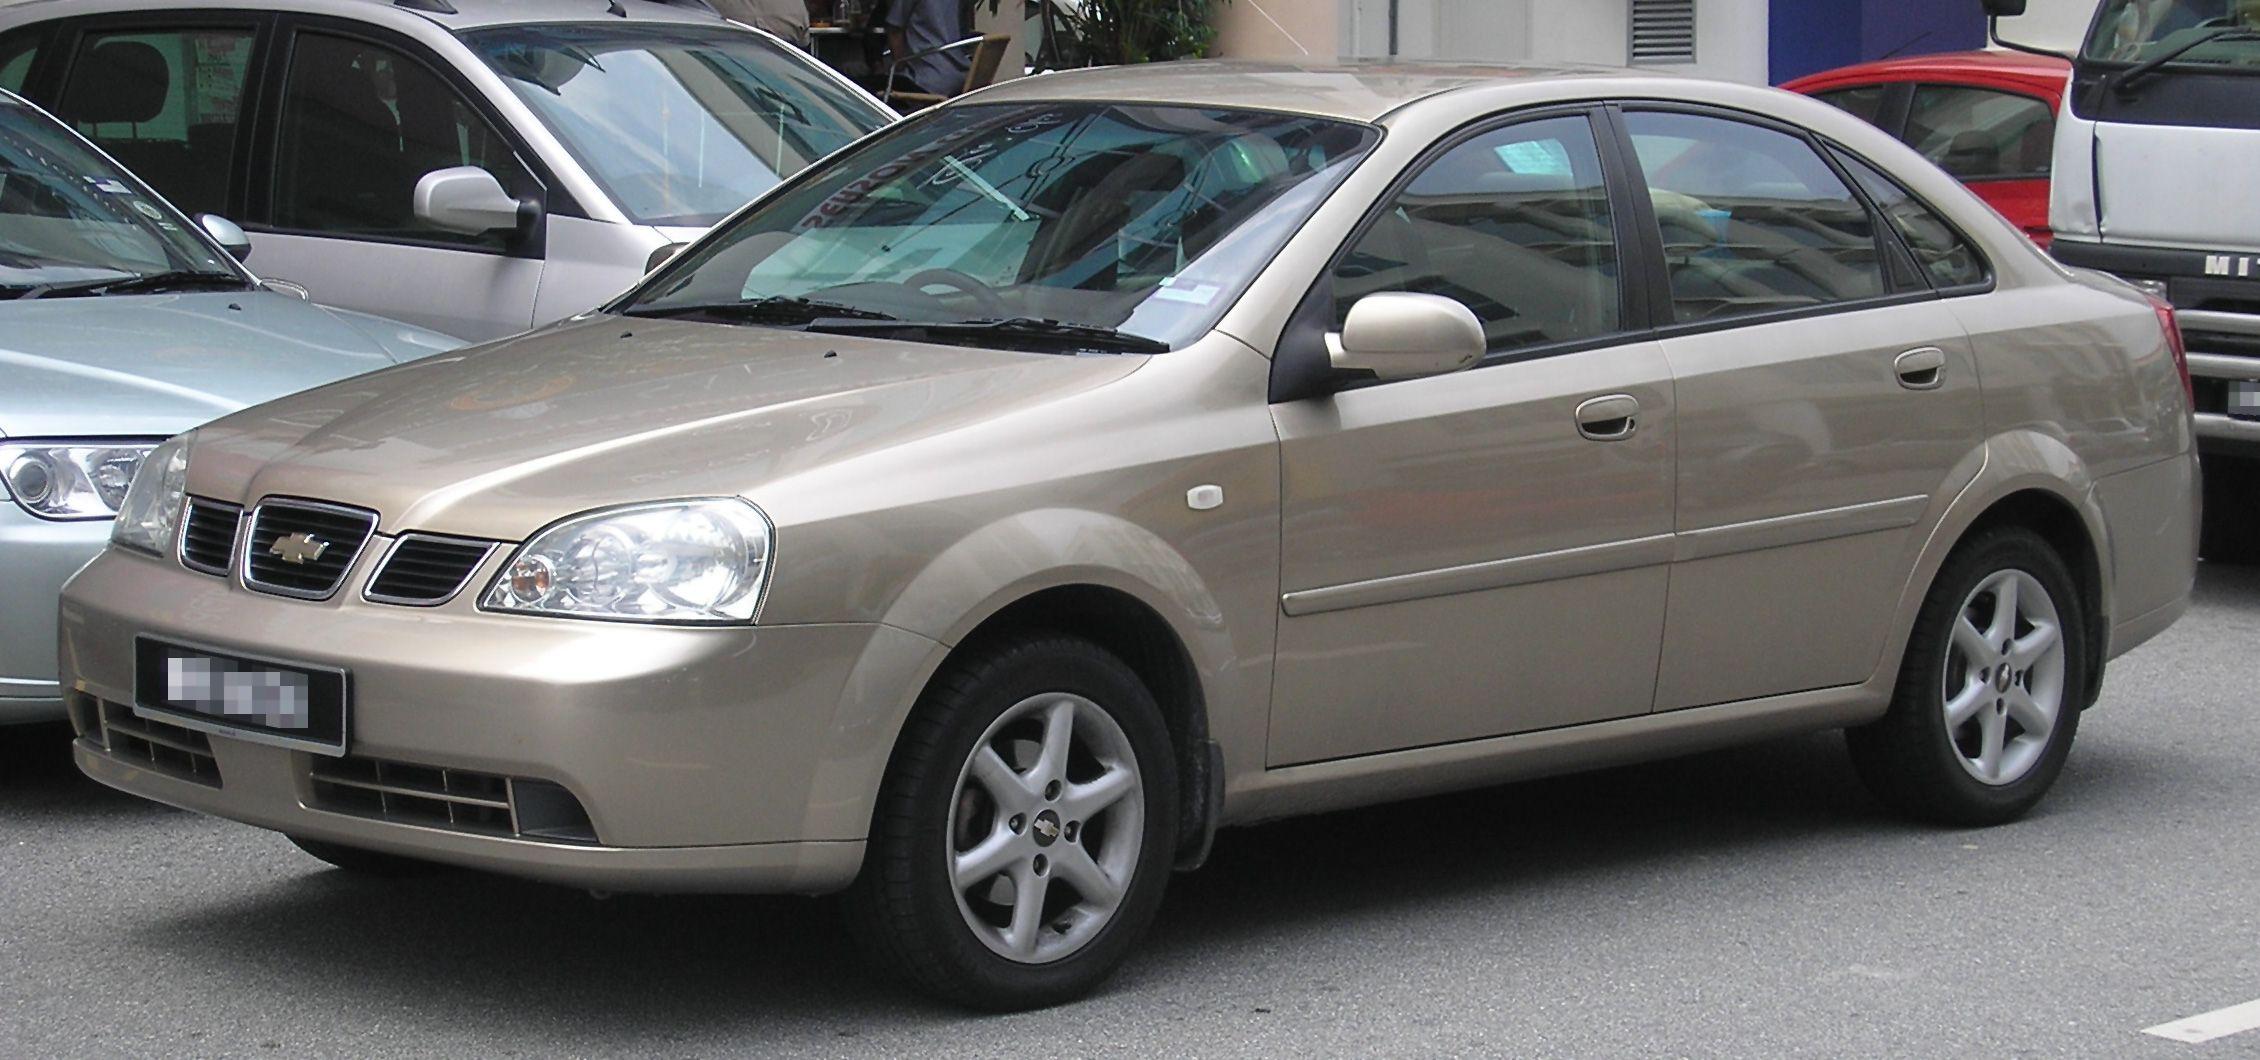 Chevrolet Optra Chevrolet Optra Chevrolet Suv